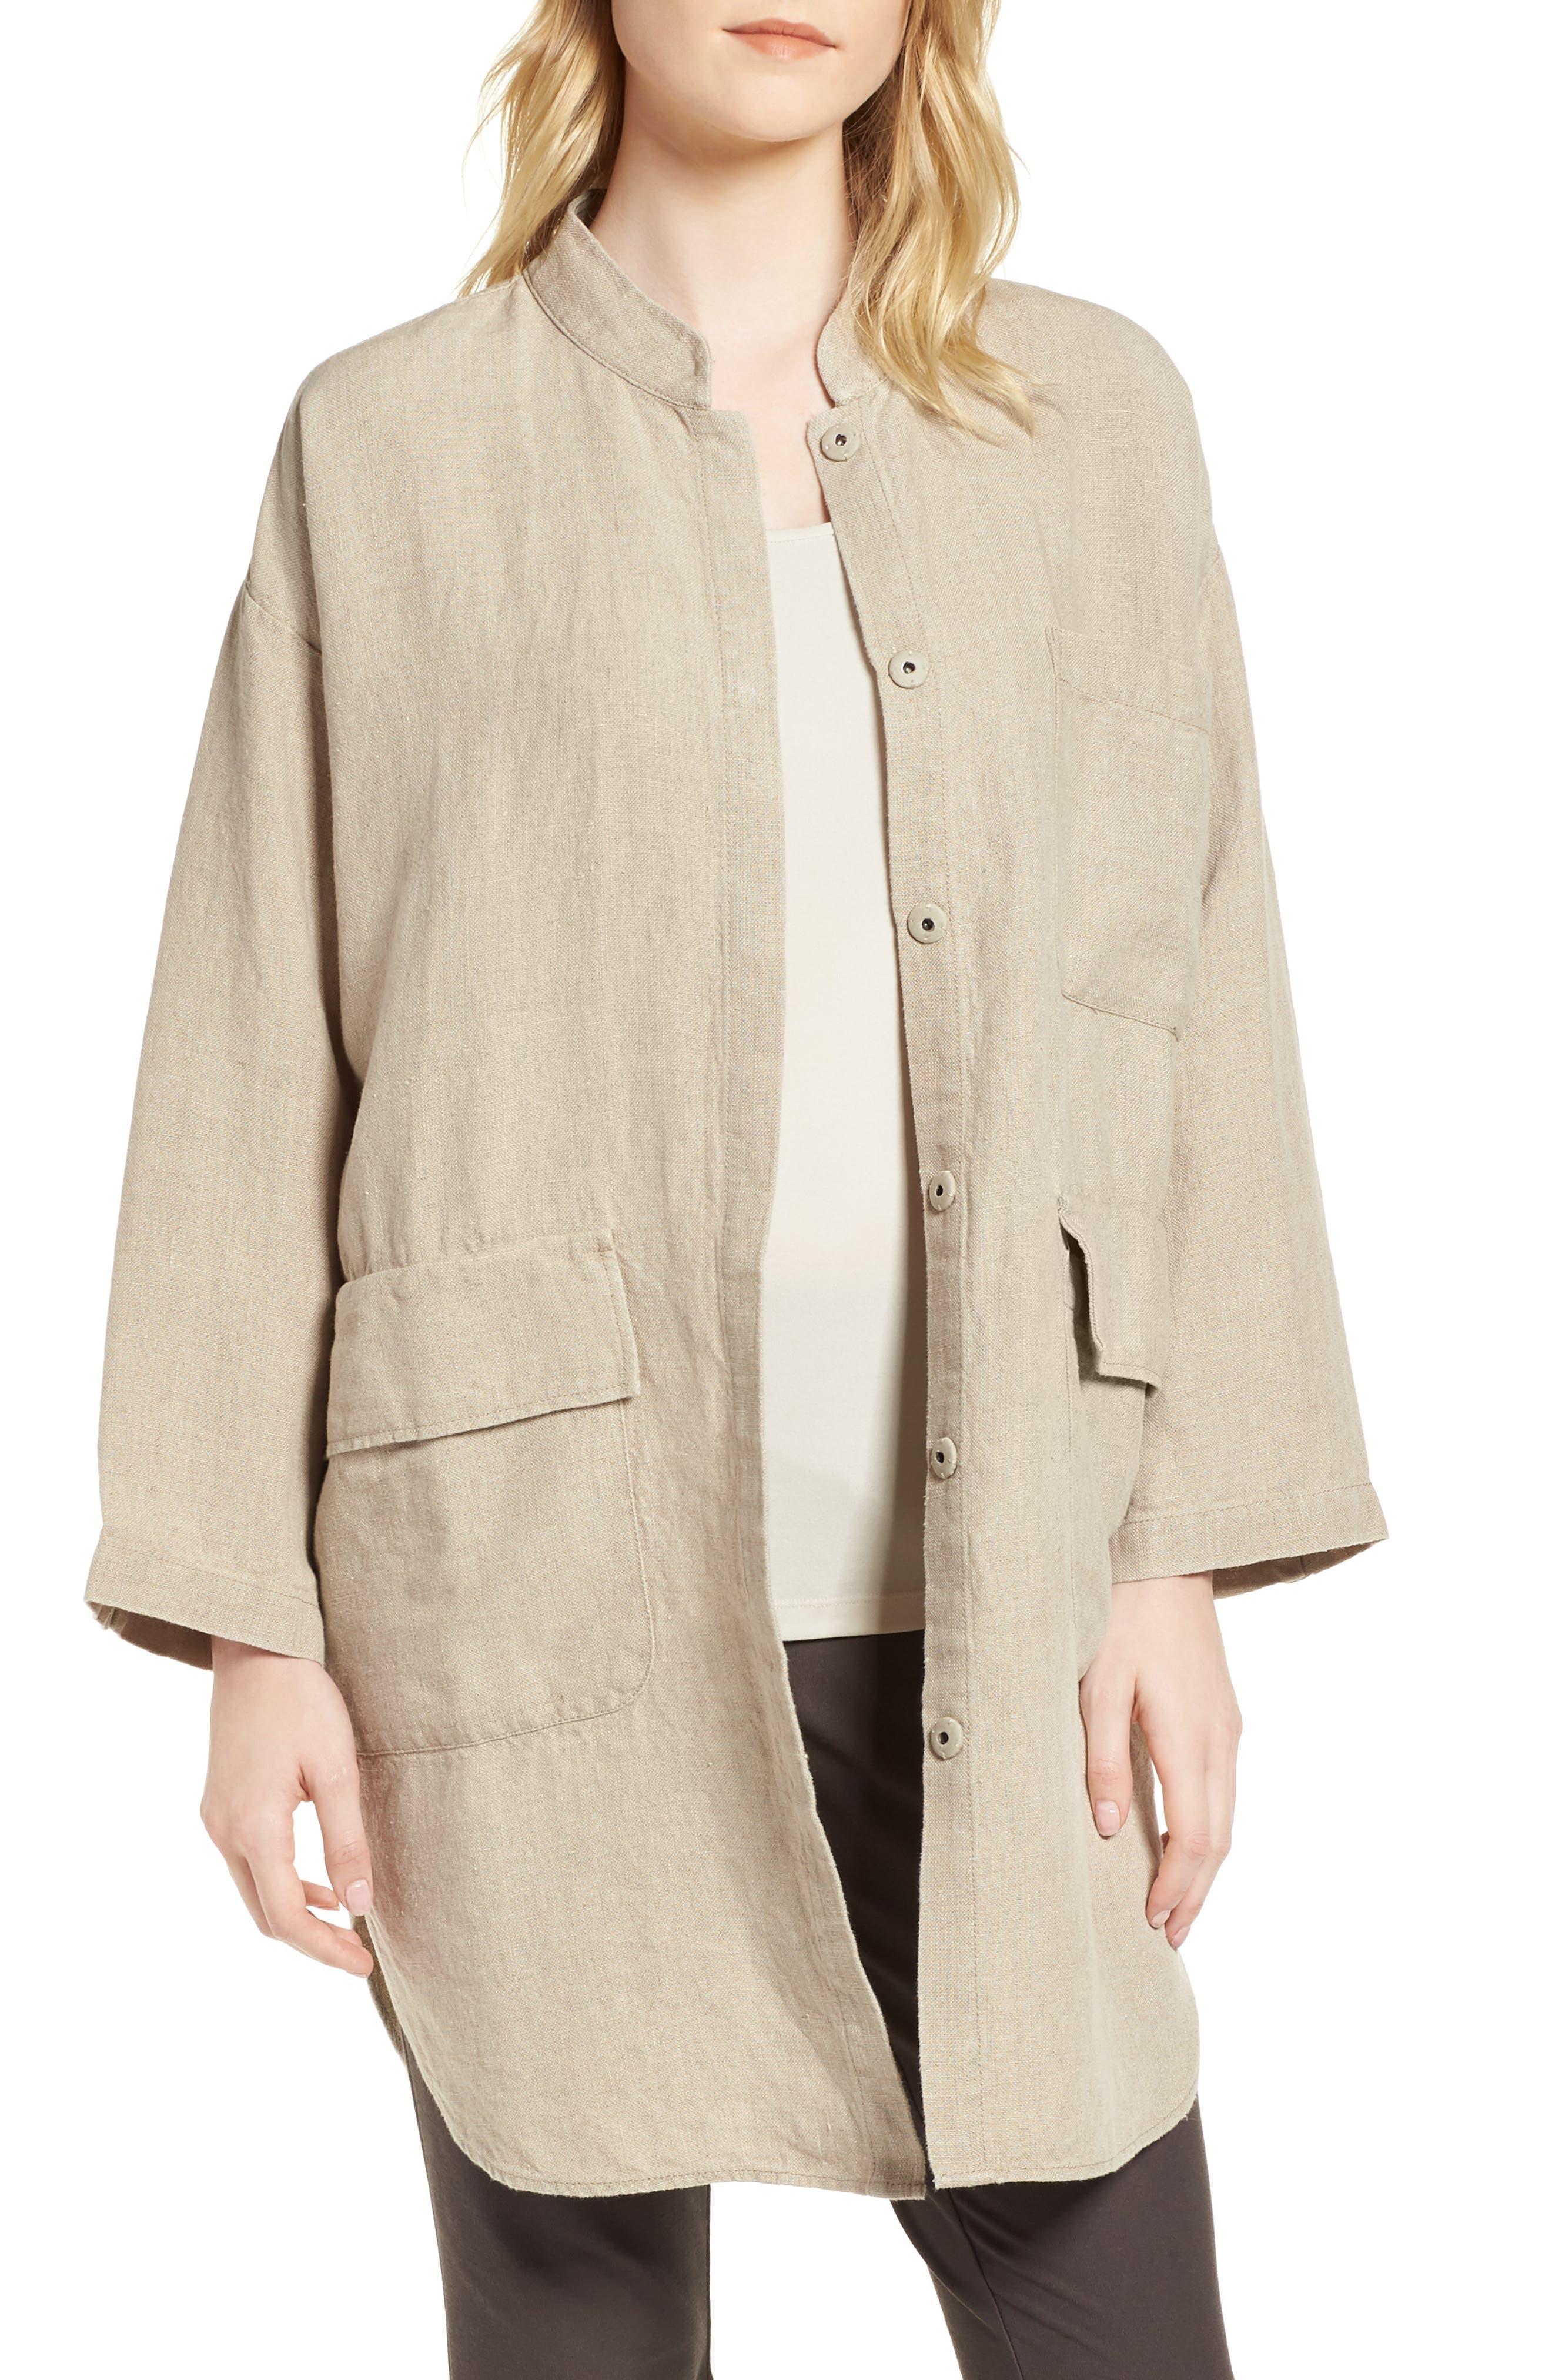 Organic Linen Jacket,                         Main,                         color, Undyed Natural